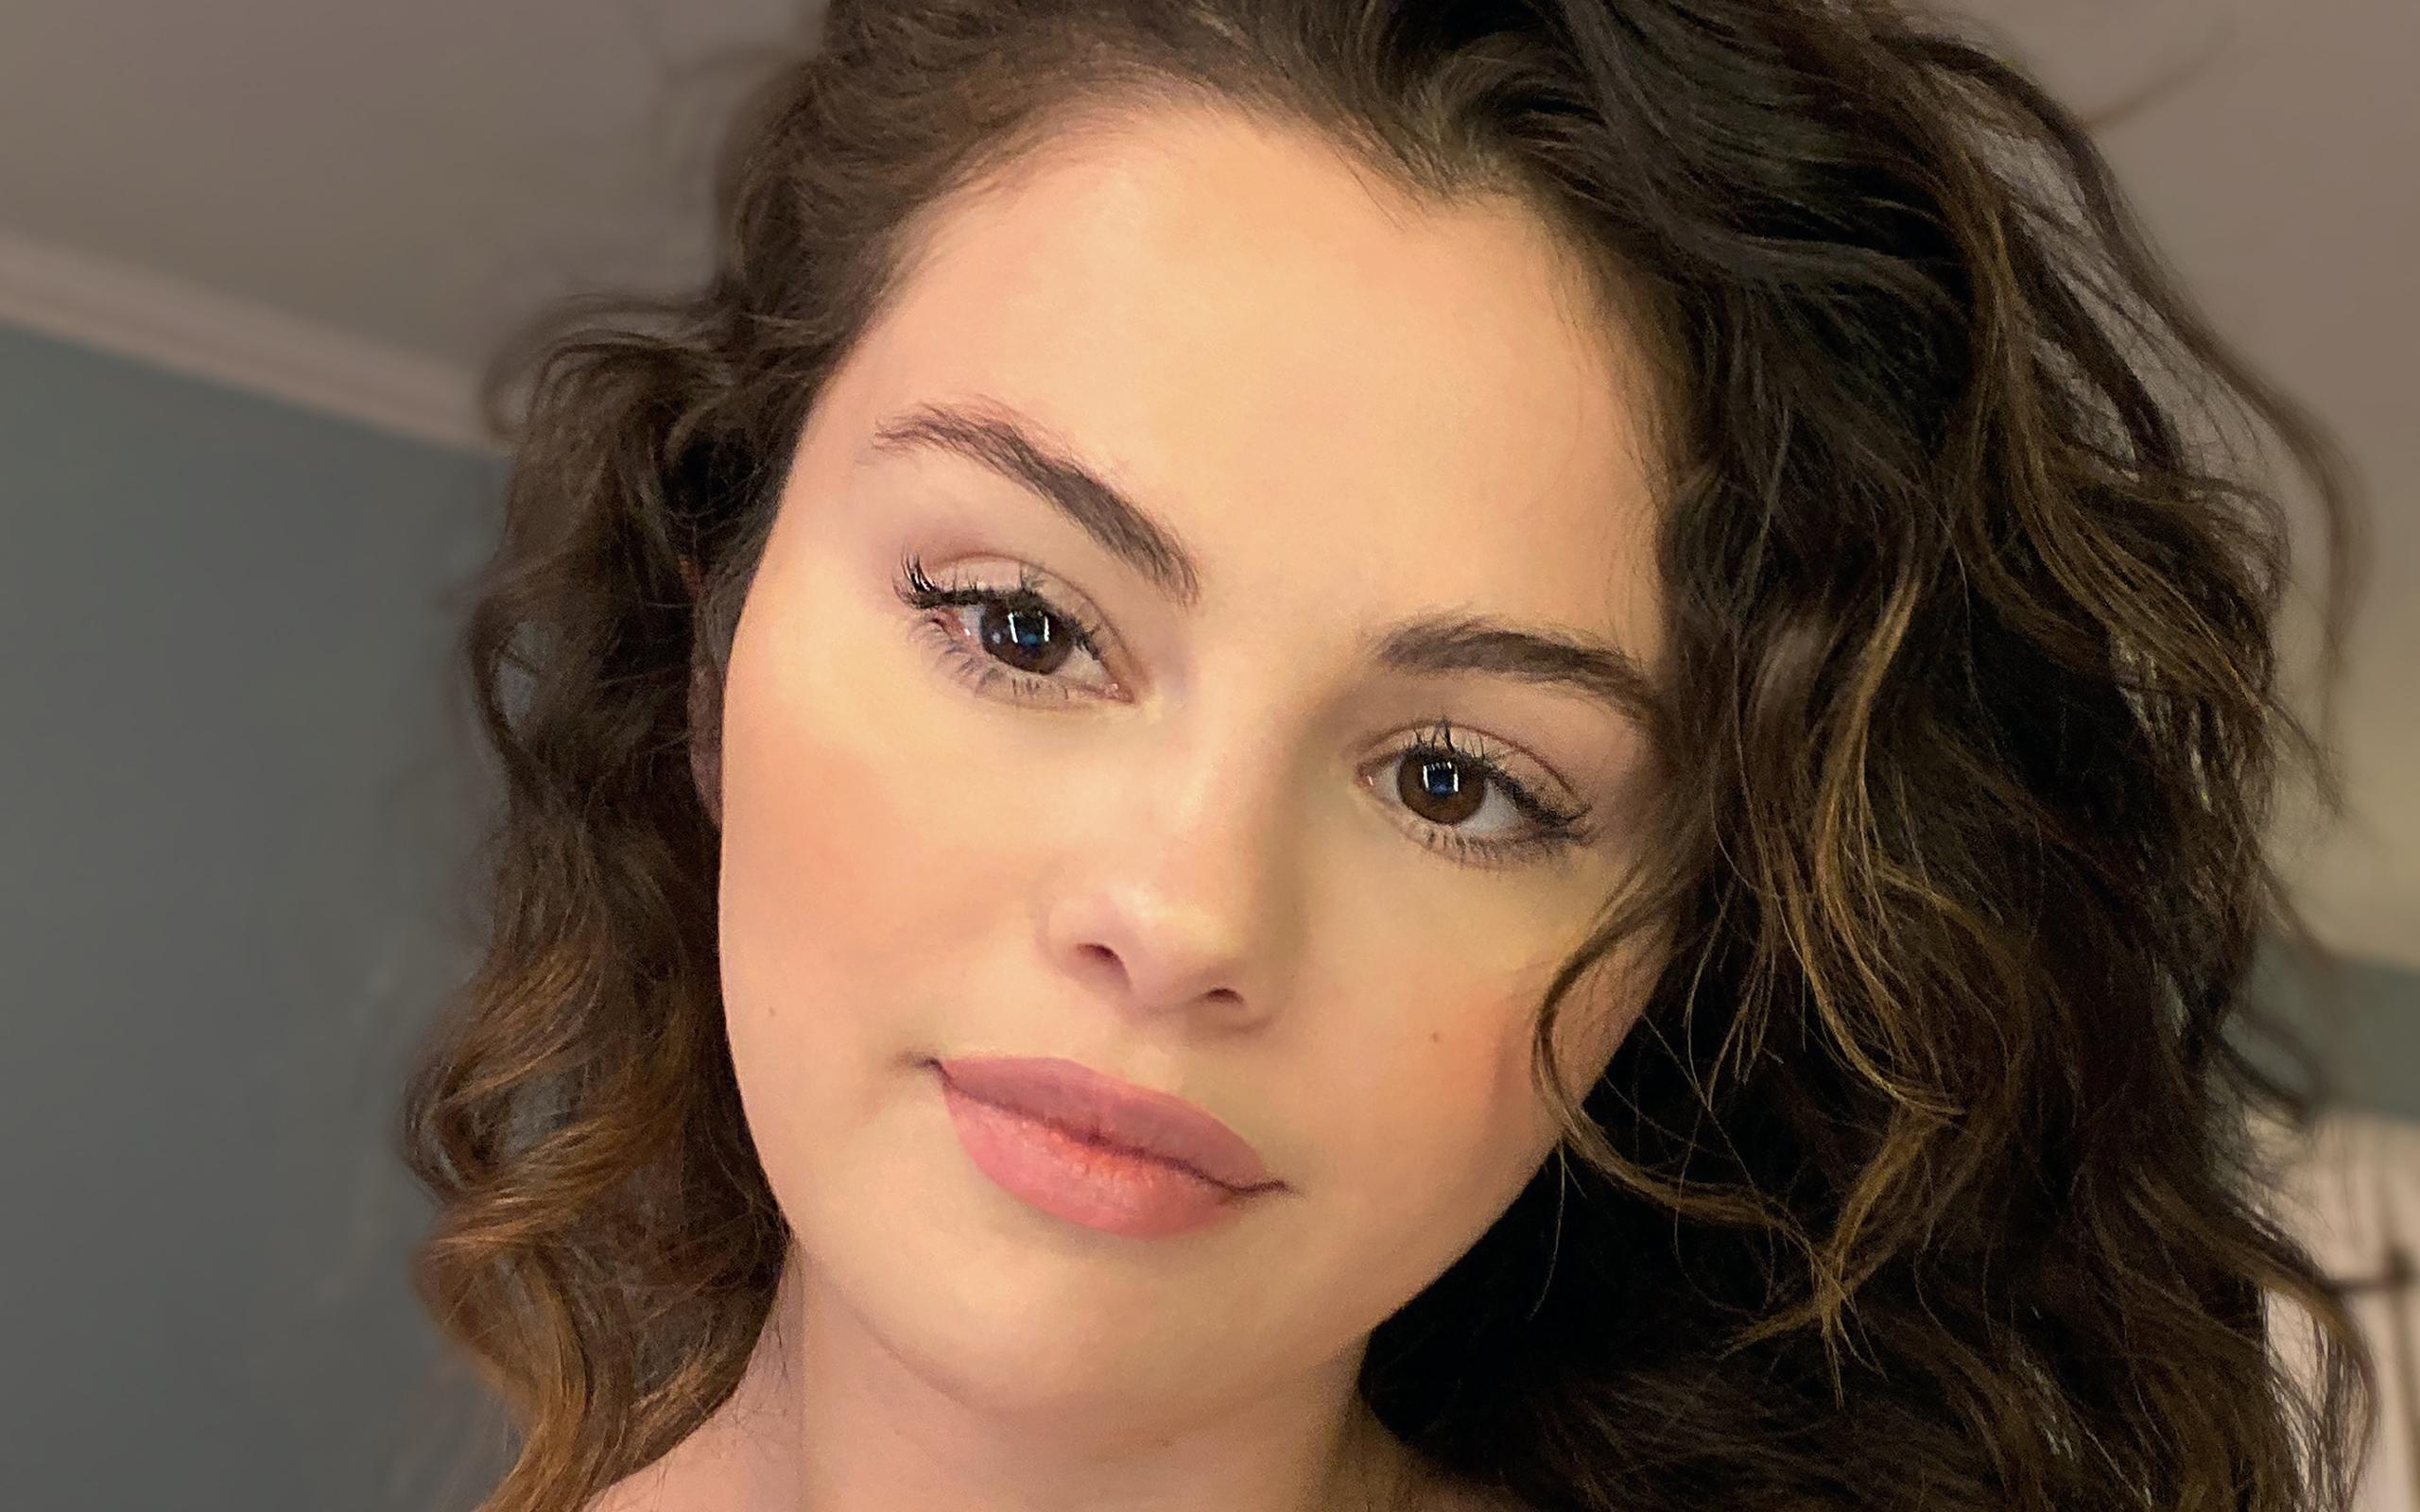 2560x1600 4K Selena Gomez without Makeup 2020 2560x1600